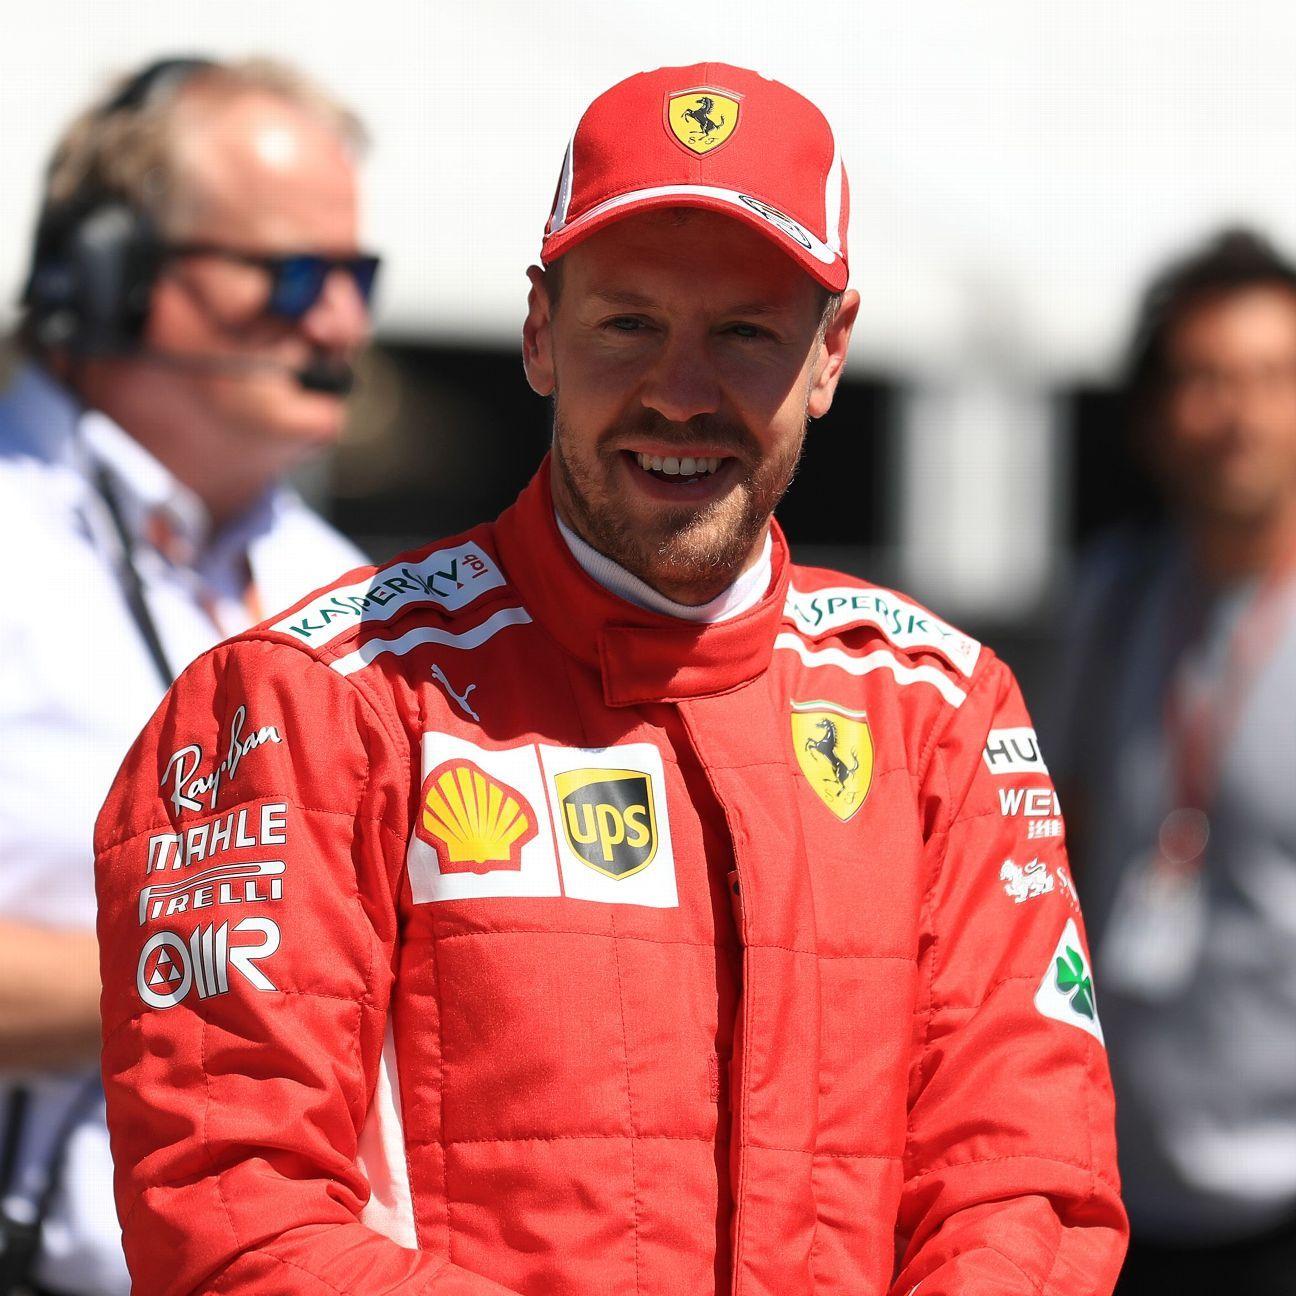 Kimi Raikkonen blames costly Q3 error on understeer